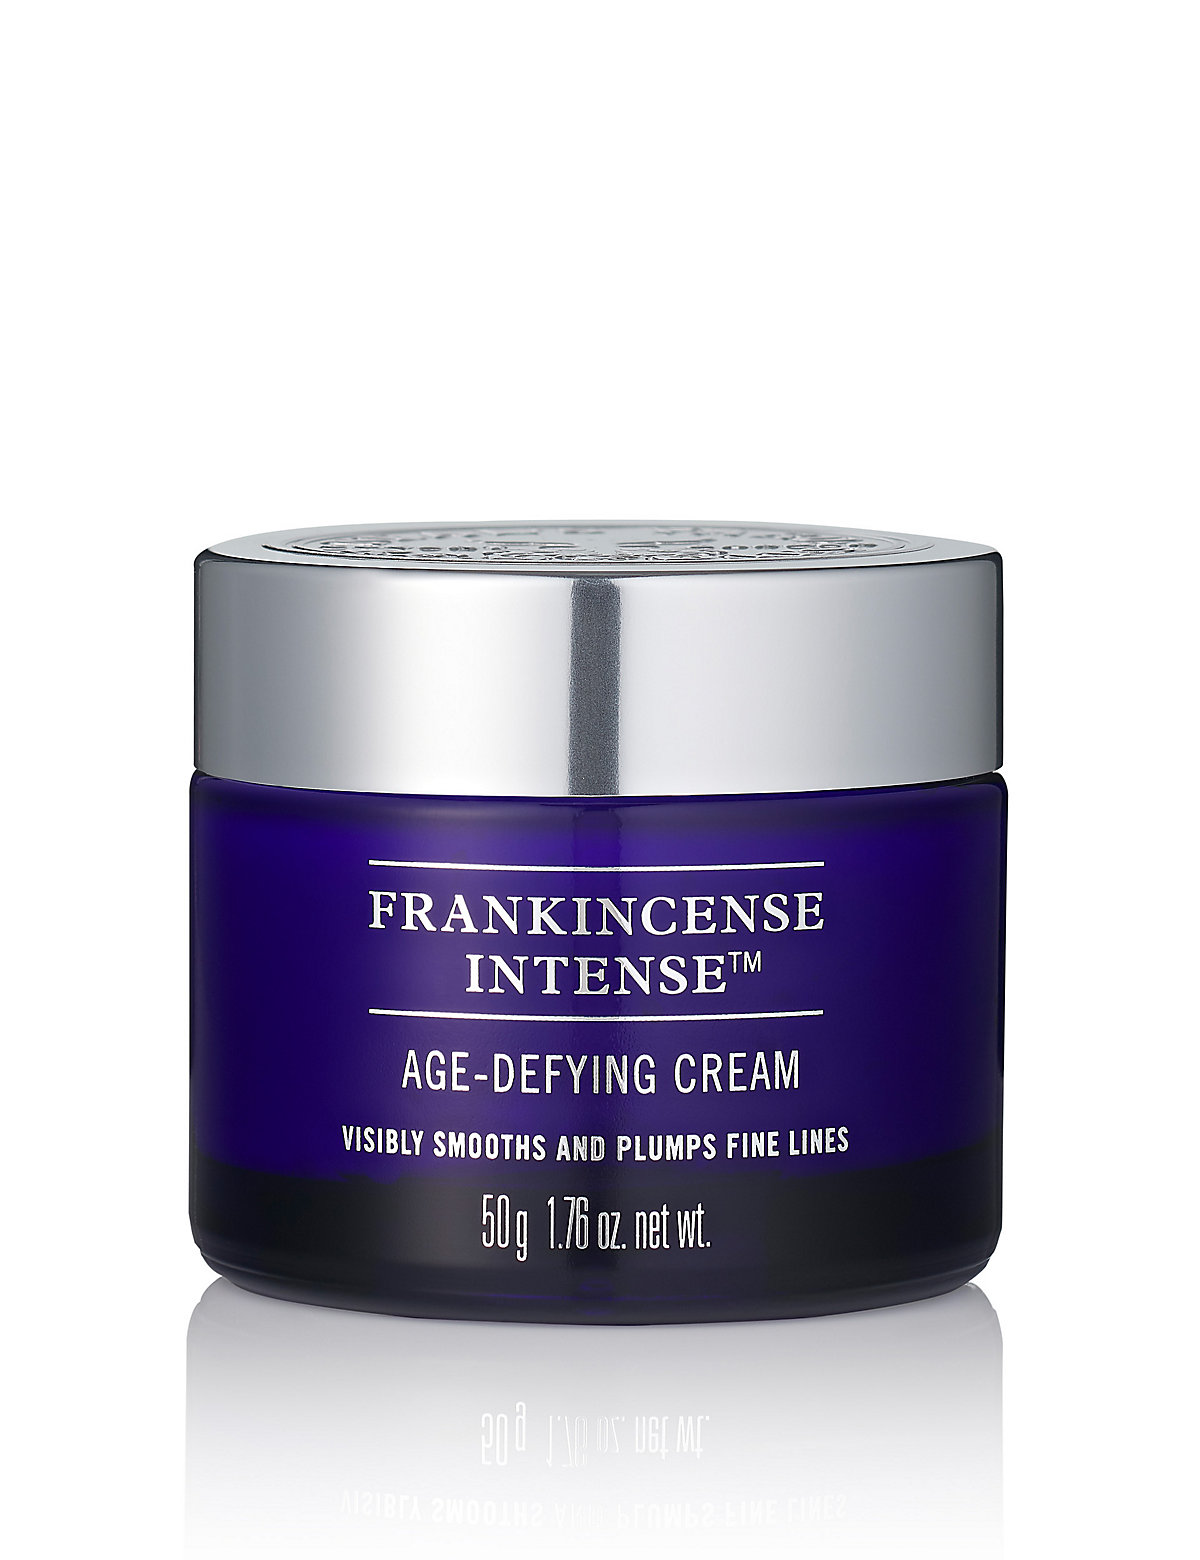 Neal's Yard Remedies Frankincense Intense Age Defying Cream 50g